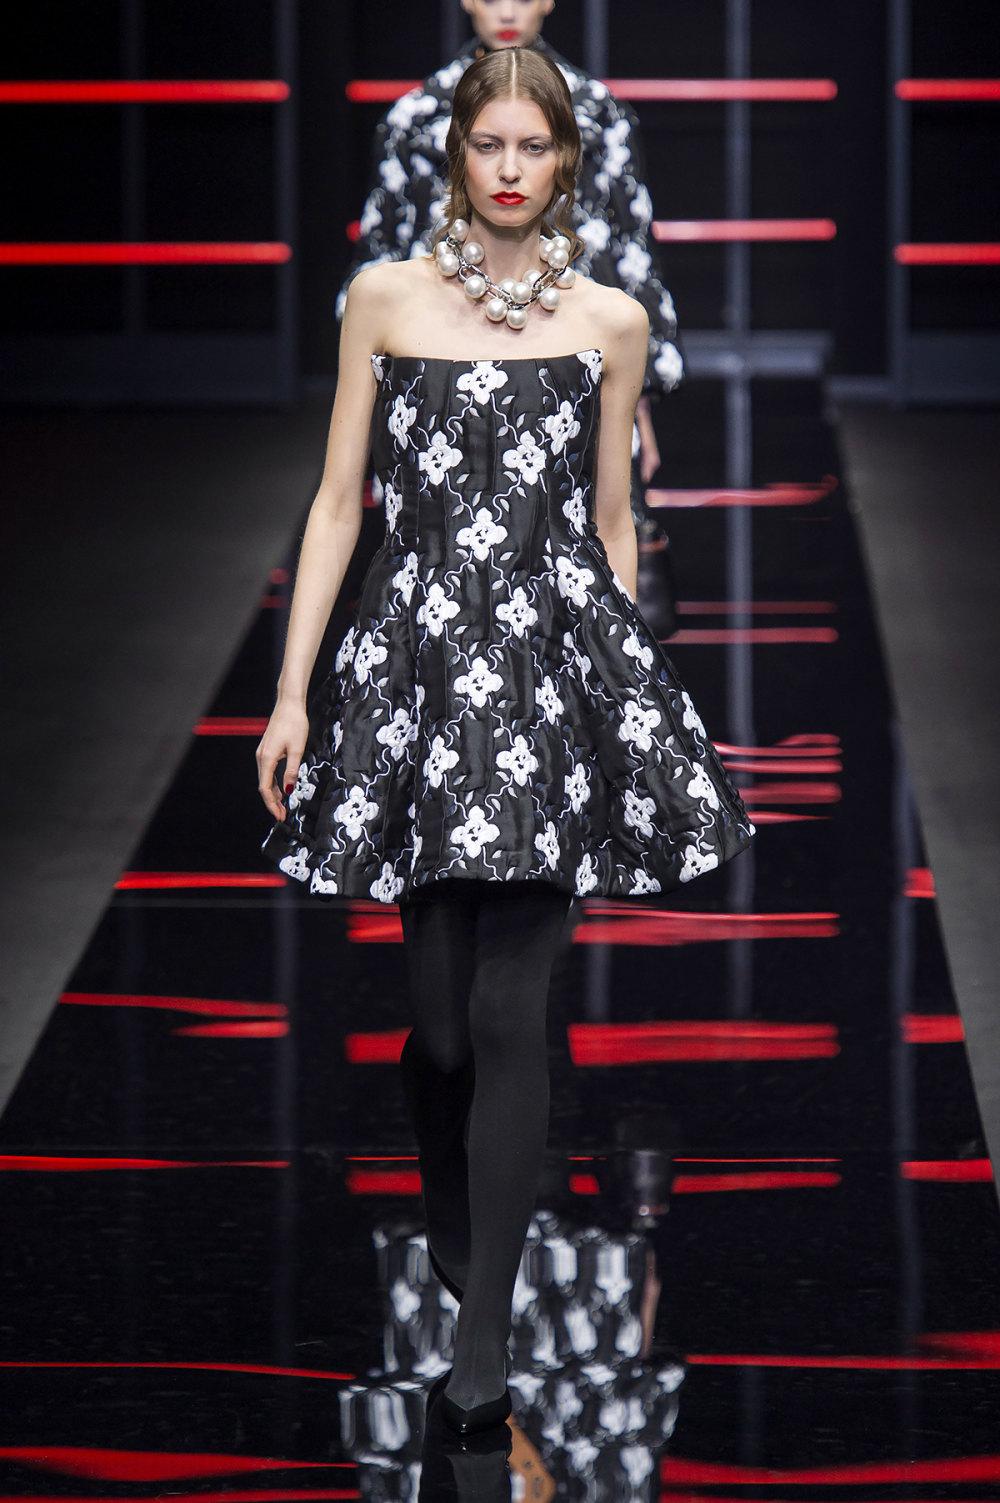 Emporio Armani时装系列畅的裤子带有柔滑裙子的鸡尾酒礼服-46.jpg